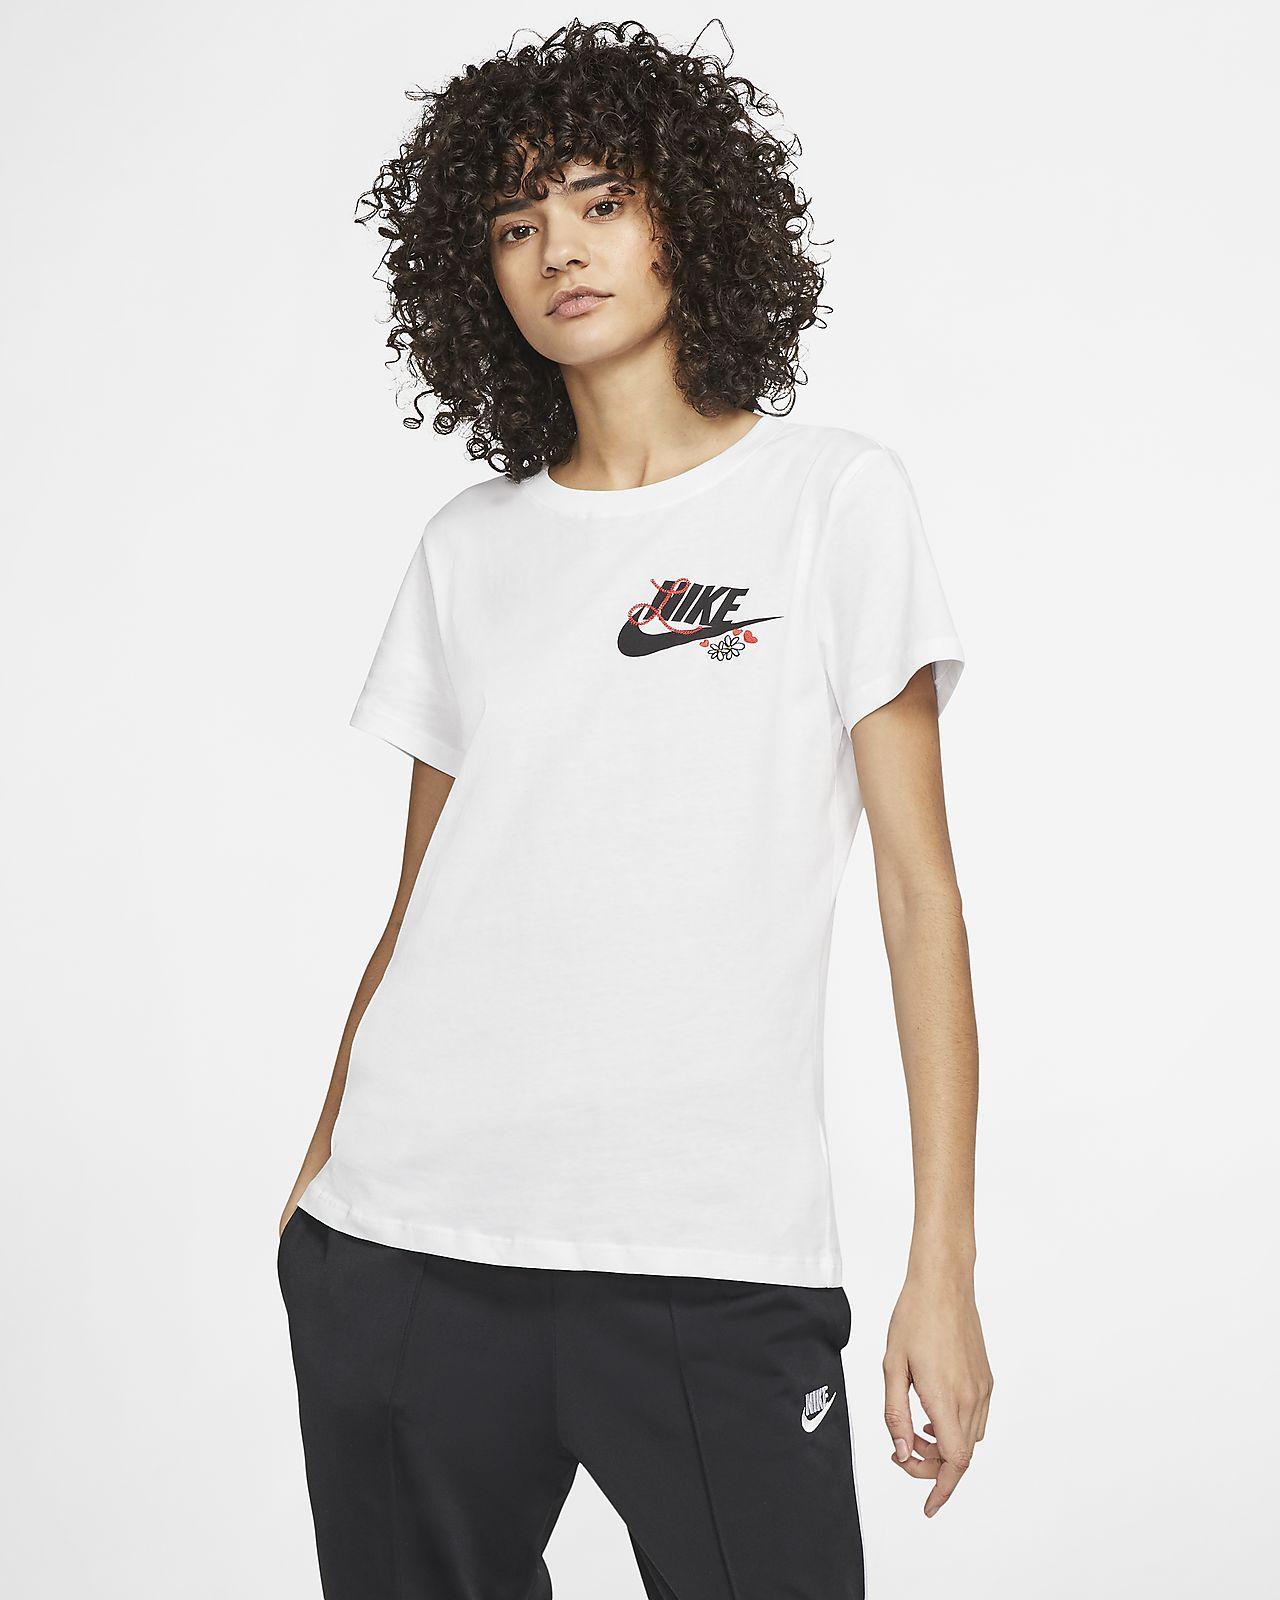 tee shirt nike femmes